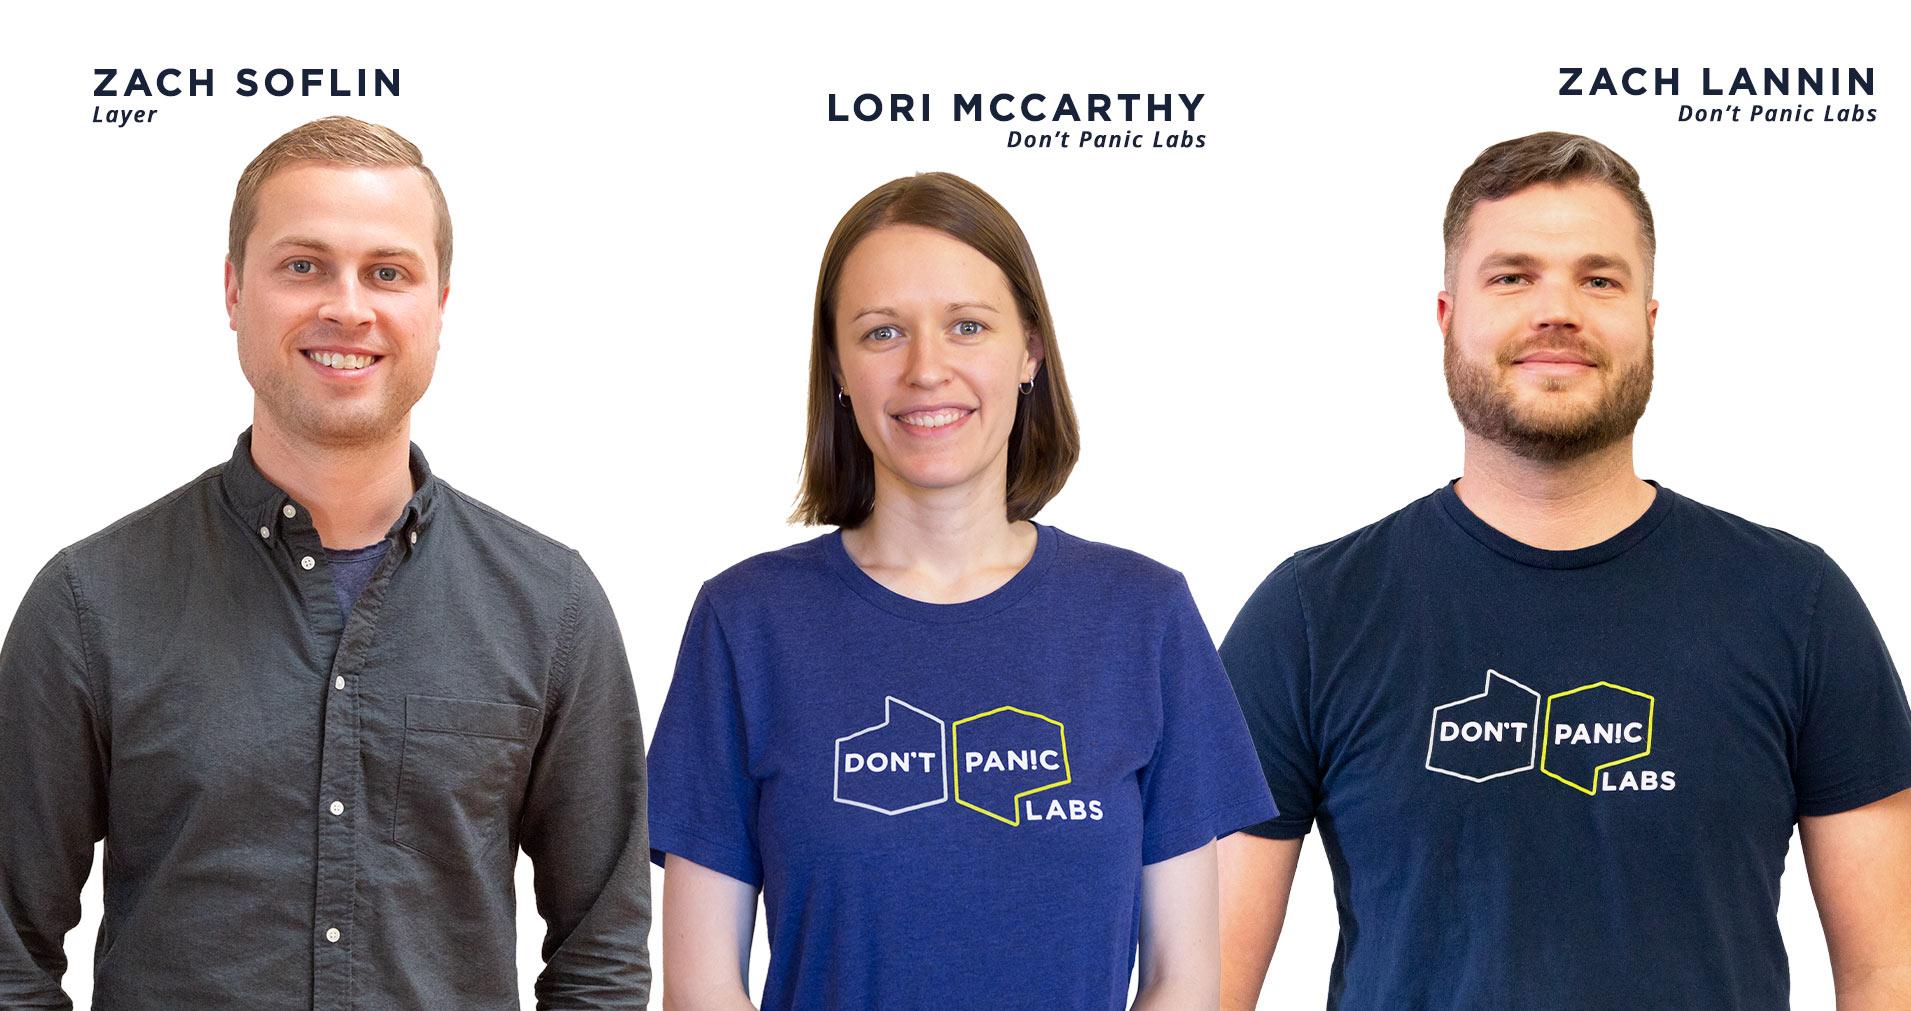 Zach Soflin of Layer & Lori McCarthy and Zach Lannin of Don't Panic Labs